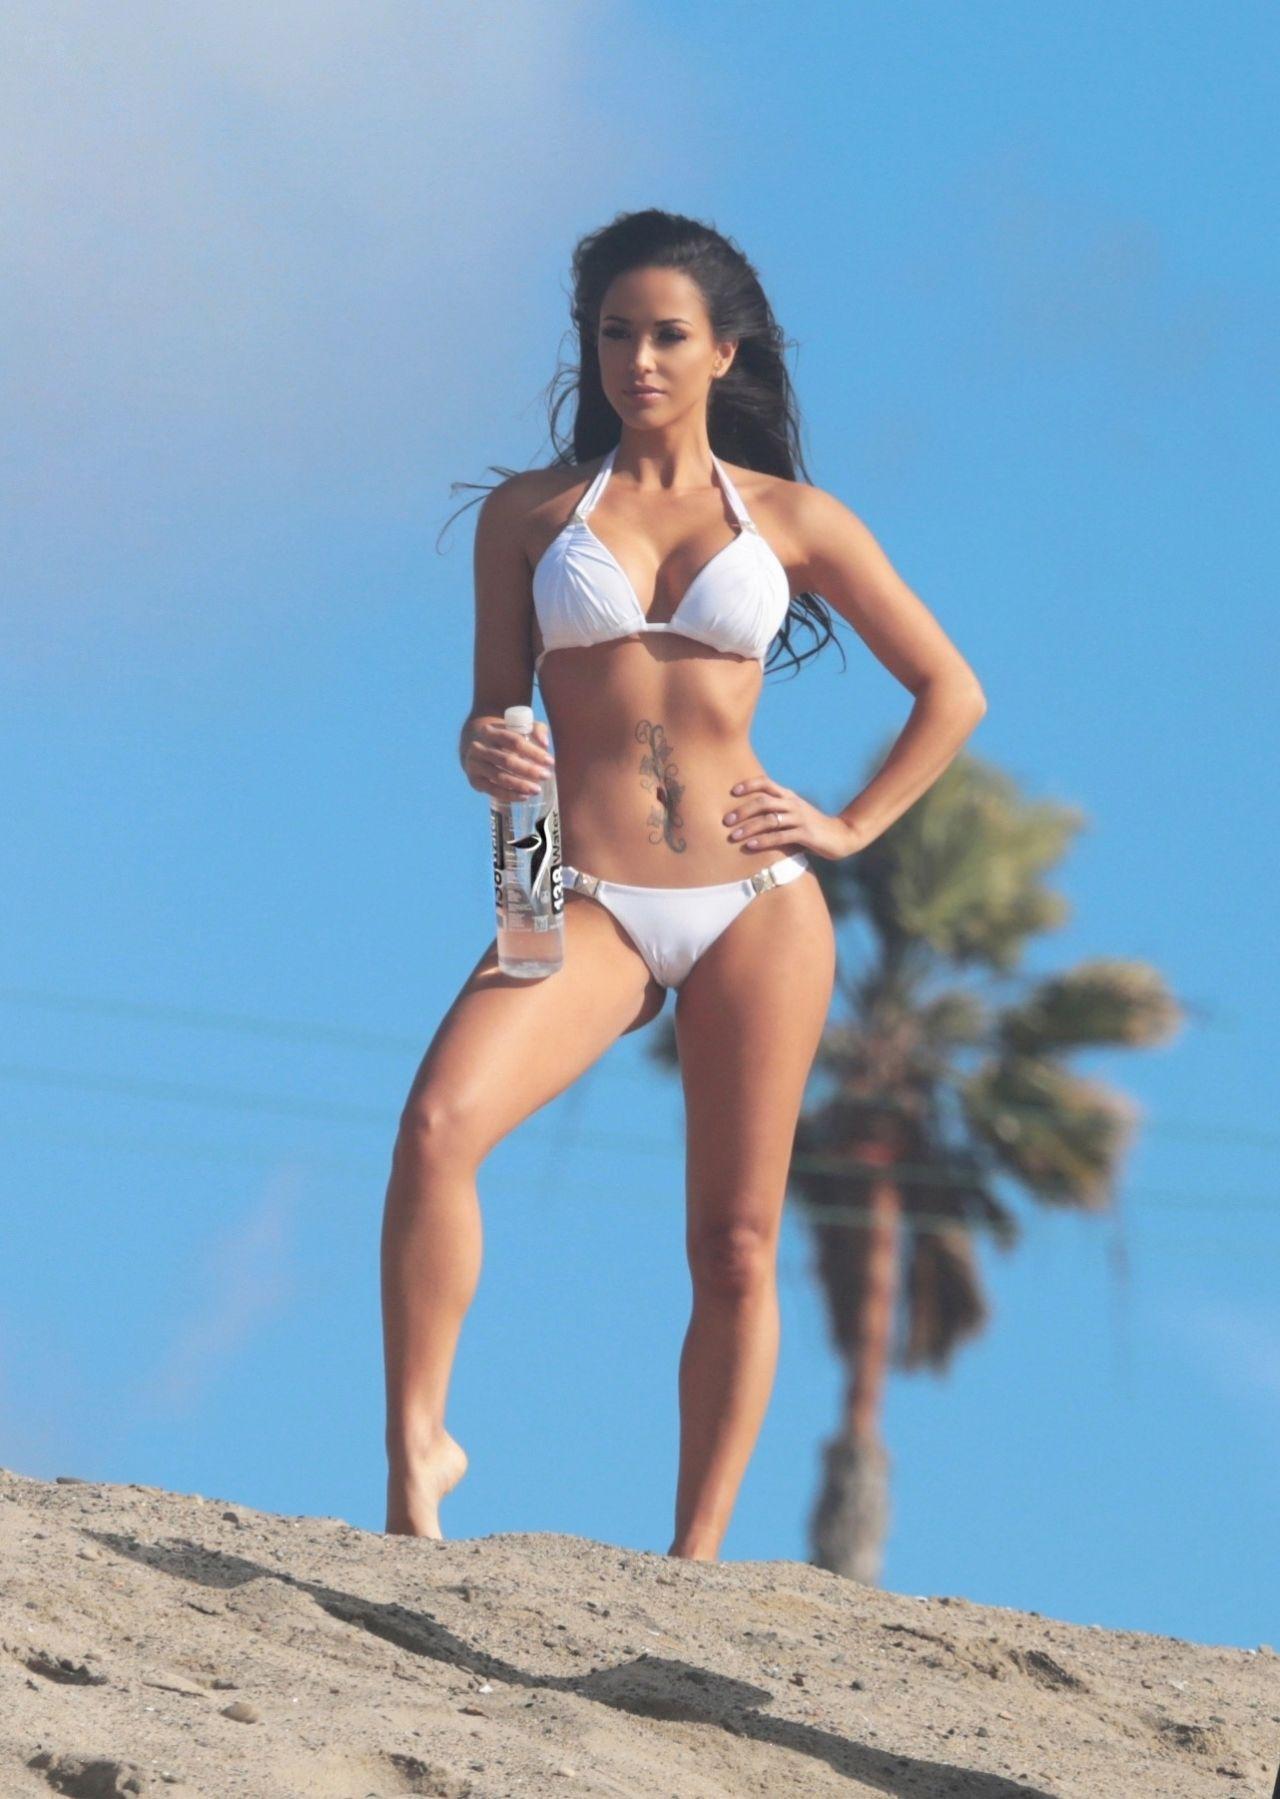 Melissa riso flaunts her bikini body nude (82 photo), Feet Celebrity photos